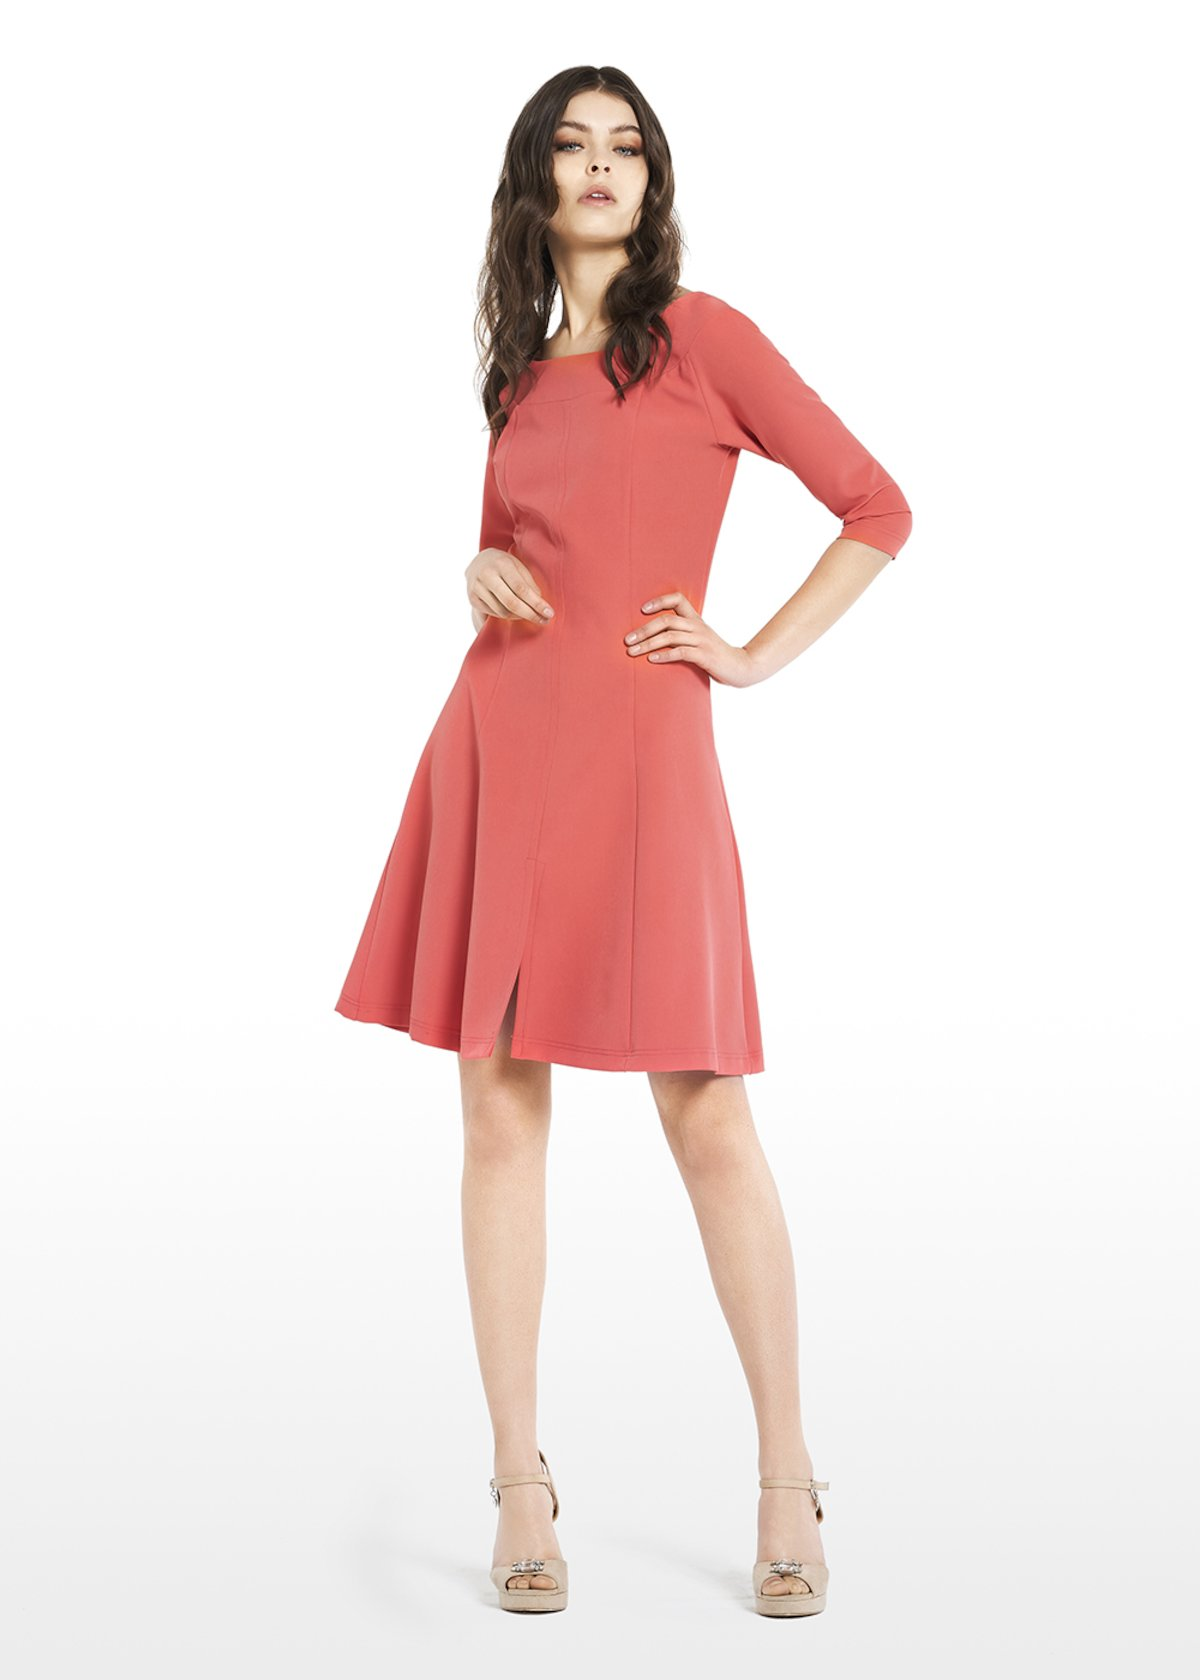 Alessio technical fabric dress with boat neckline - Flamingo - Woman